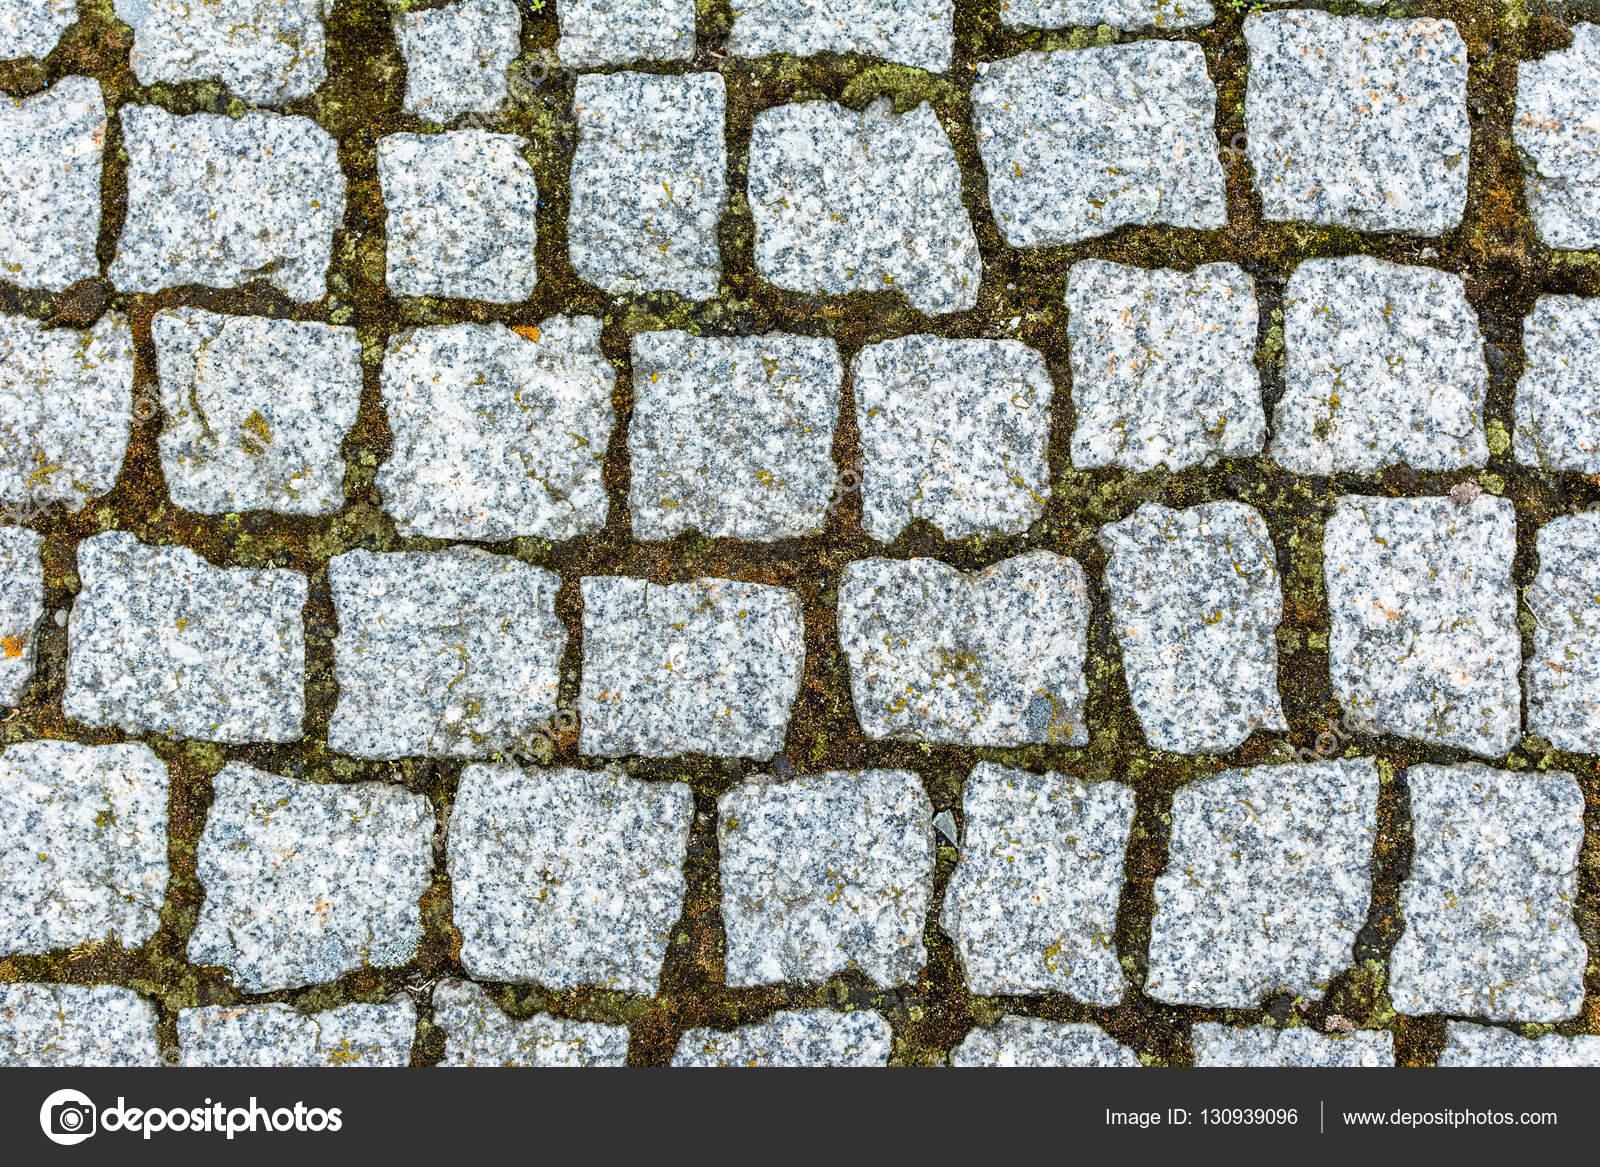 Pavimento de piedra cantera olnasa piedra natural para - Pavimentos de piedra natural ...